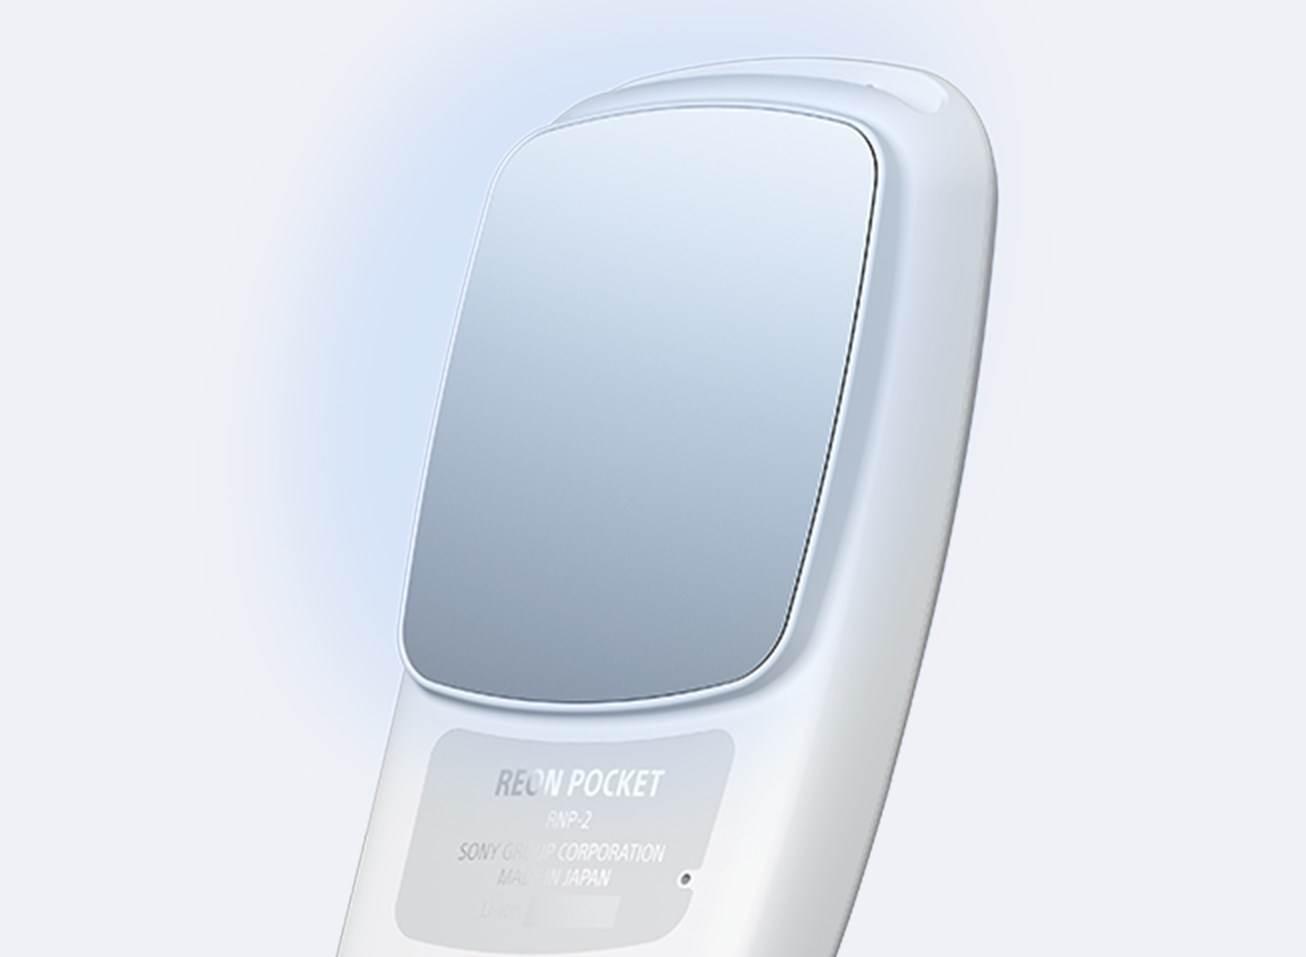 Reon Pocket 2 uređaj